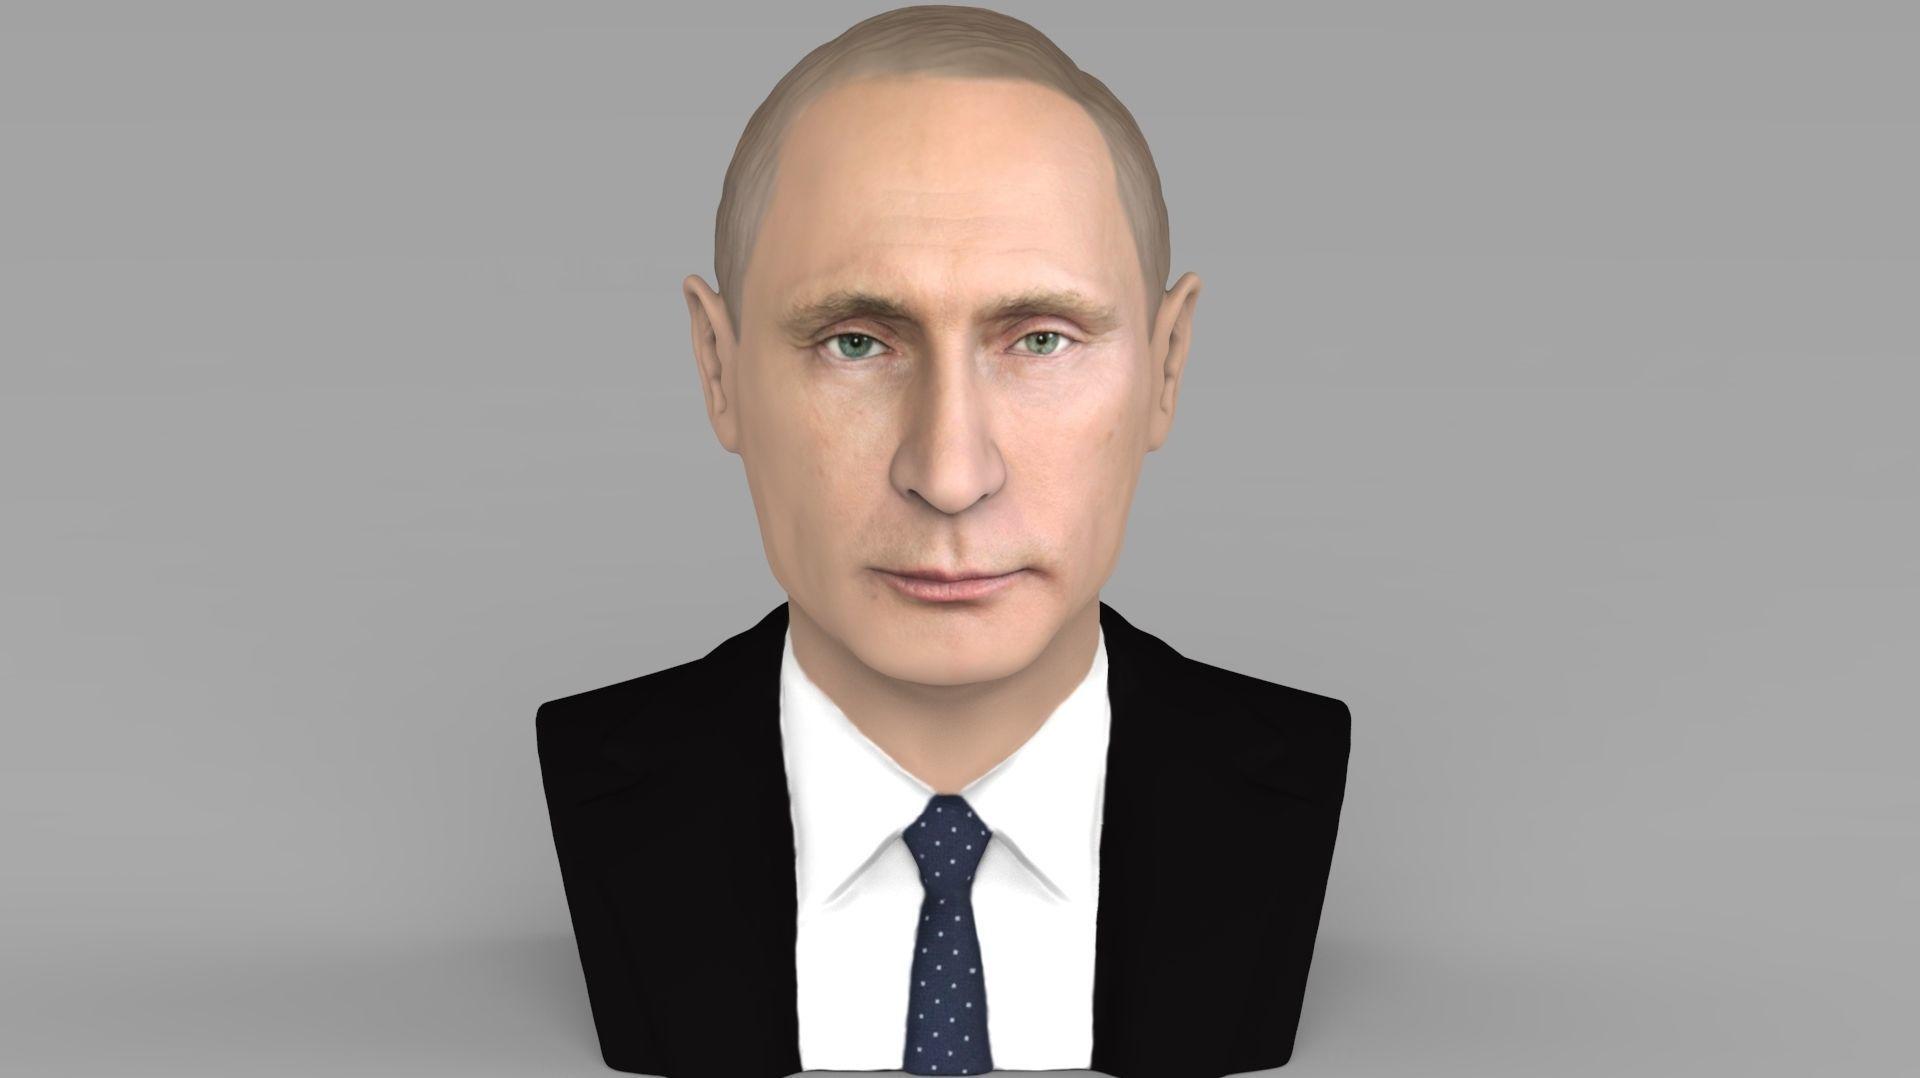 Vladimir Putin bust ready for full color 3D printing